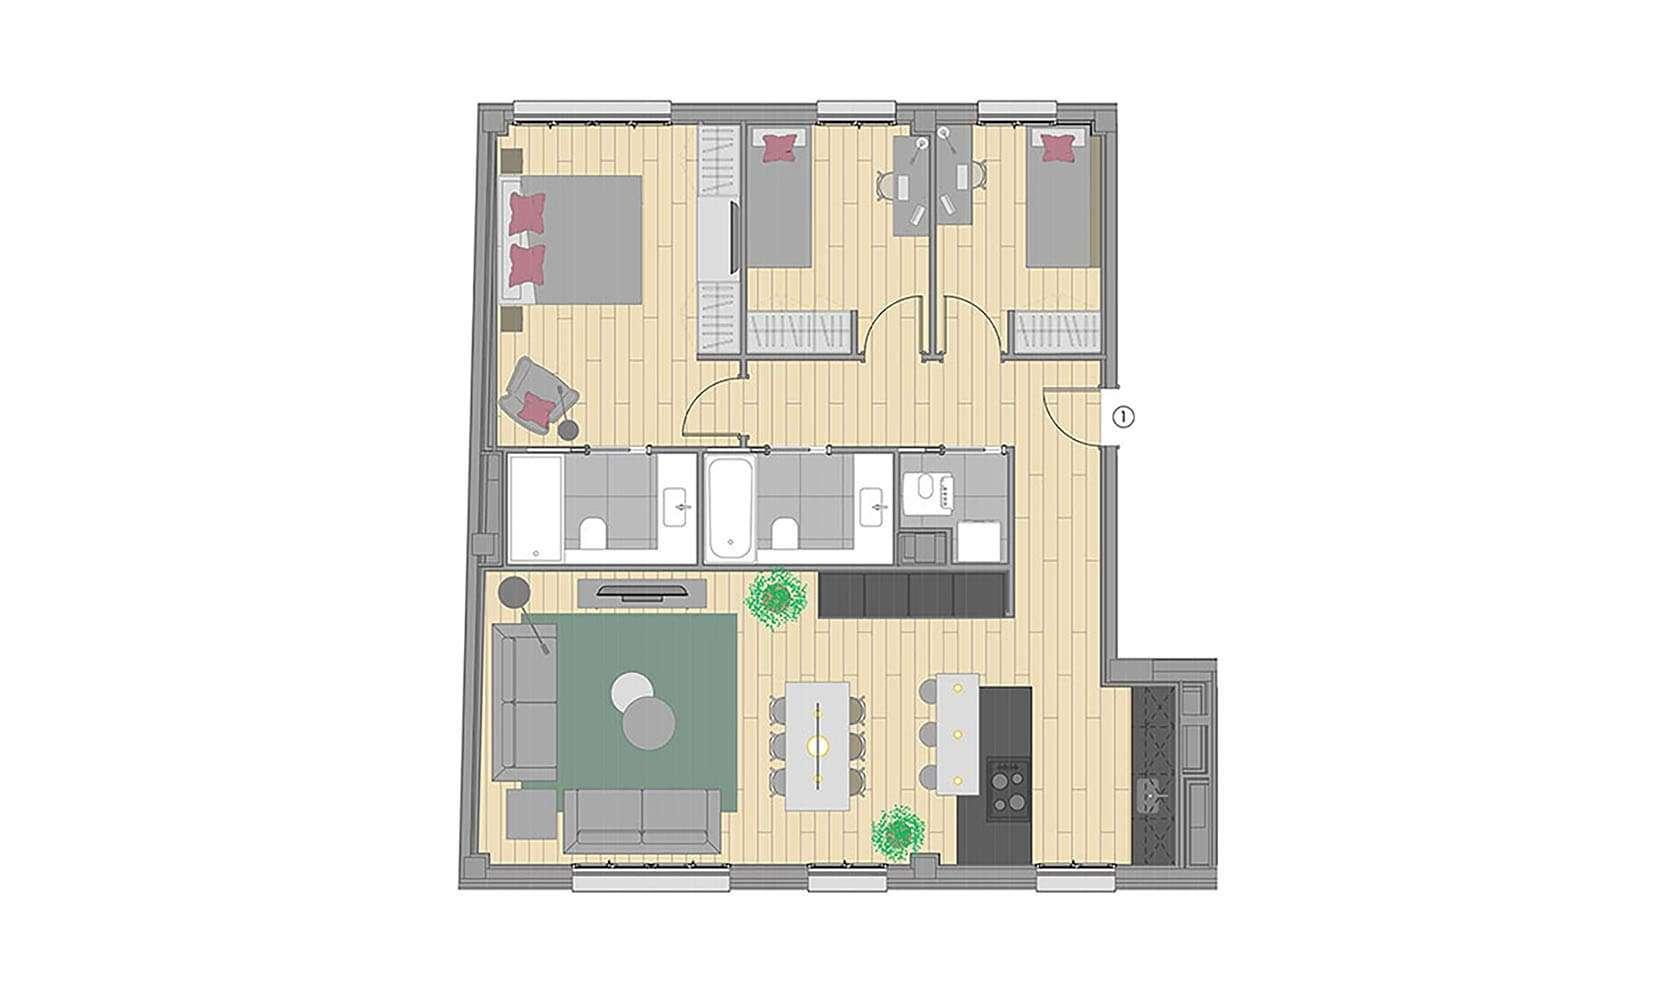 pisos-obra-nueva-gracia-barcelona-plano-1-min